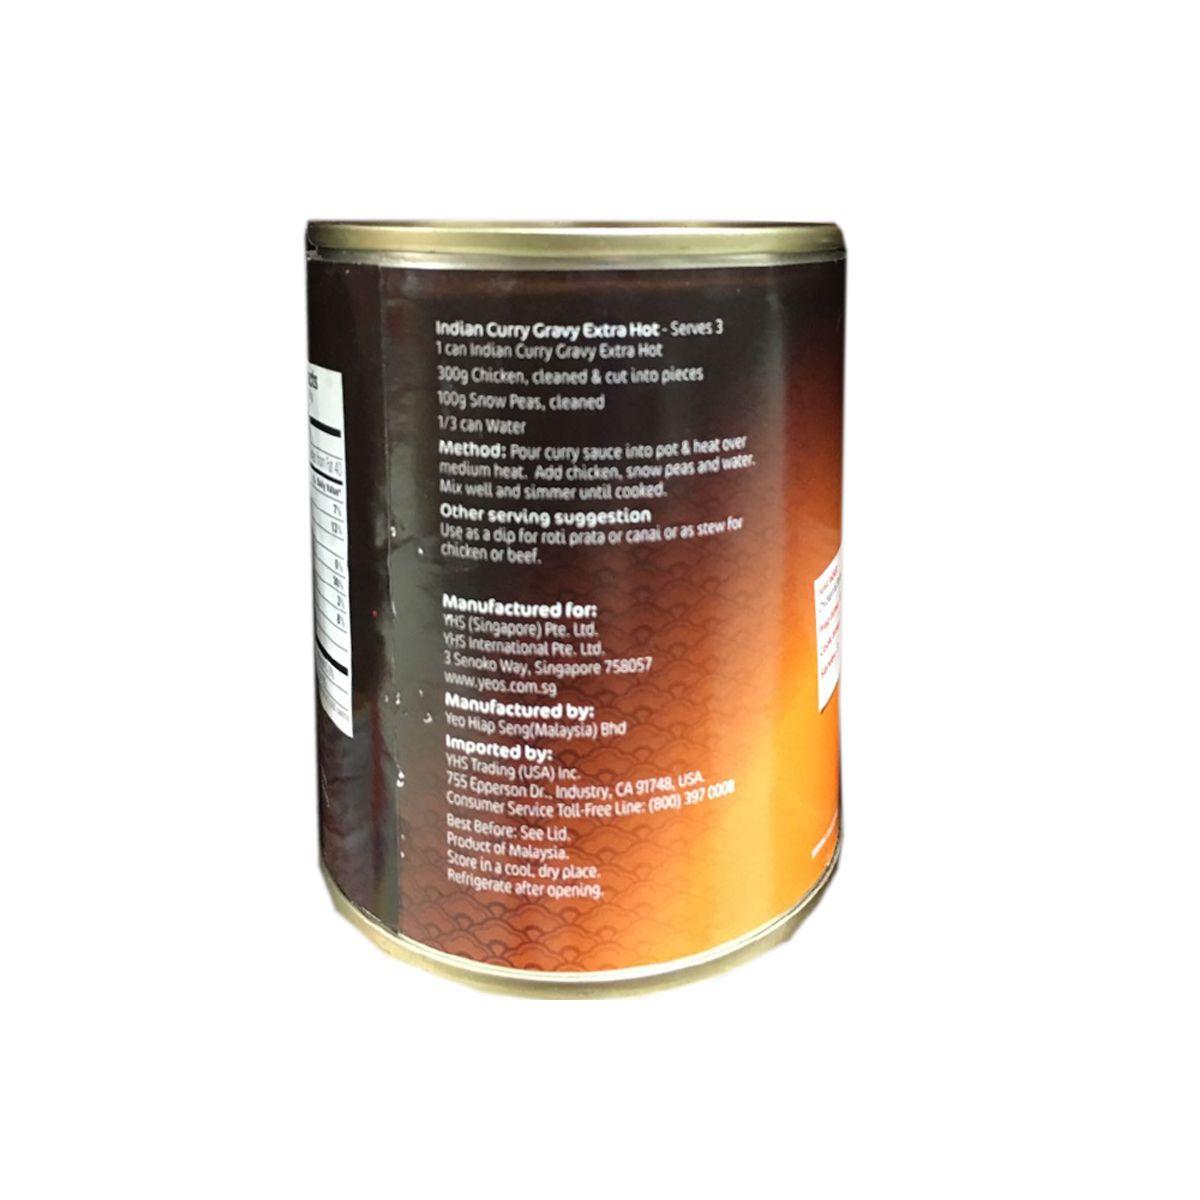 YEO'S Indian Curry Gravy Extra Hot 10.6 OZ